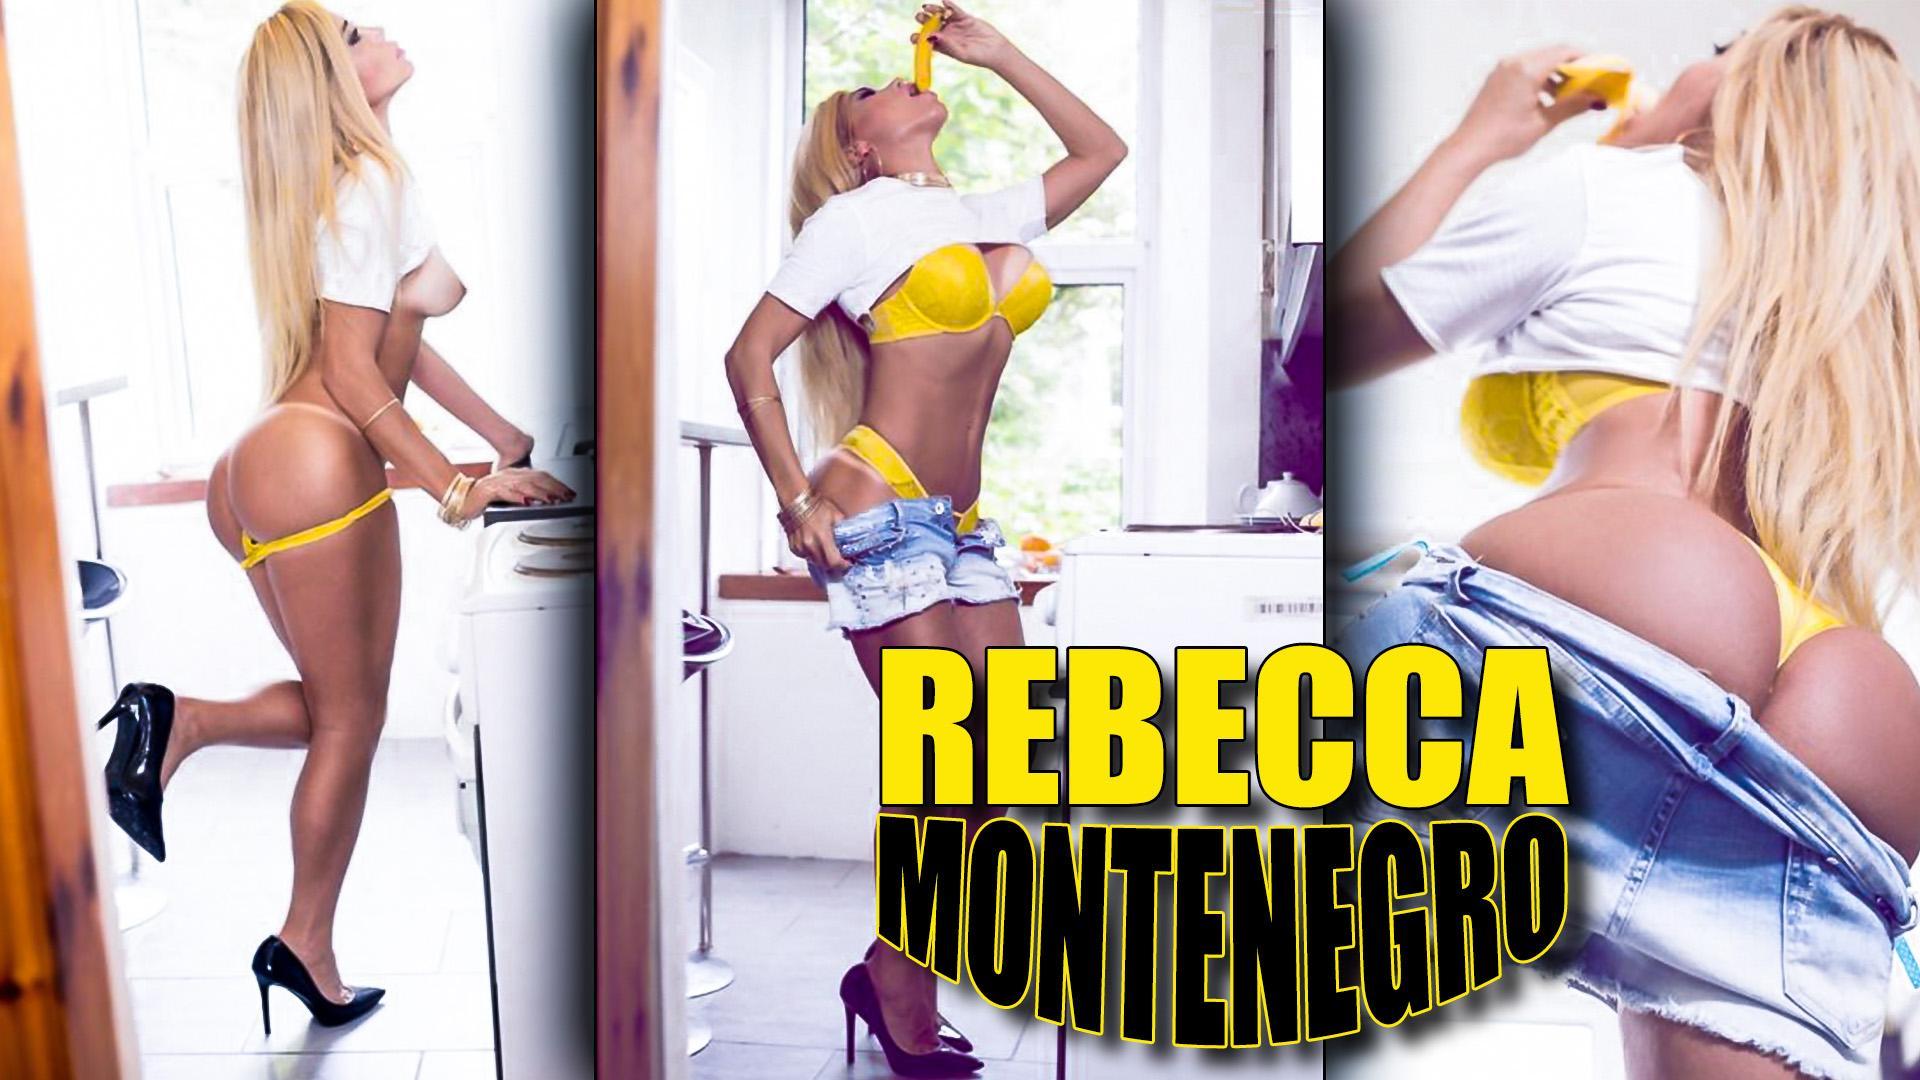 Rebecca Montenegro Shemale in Berlin